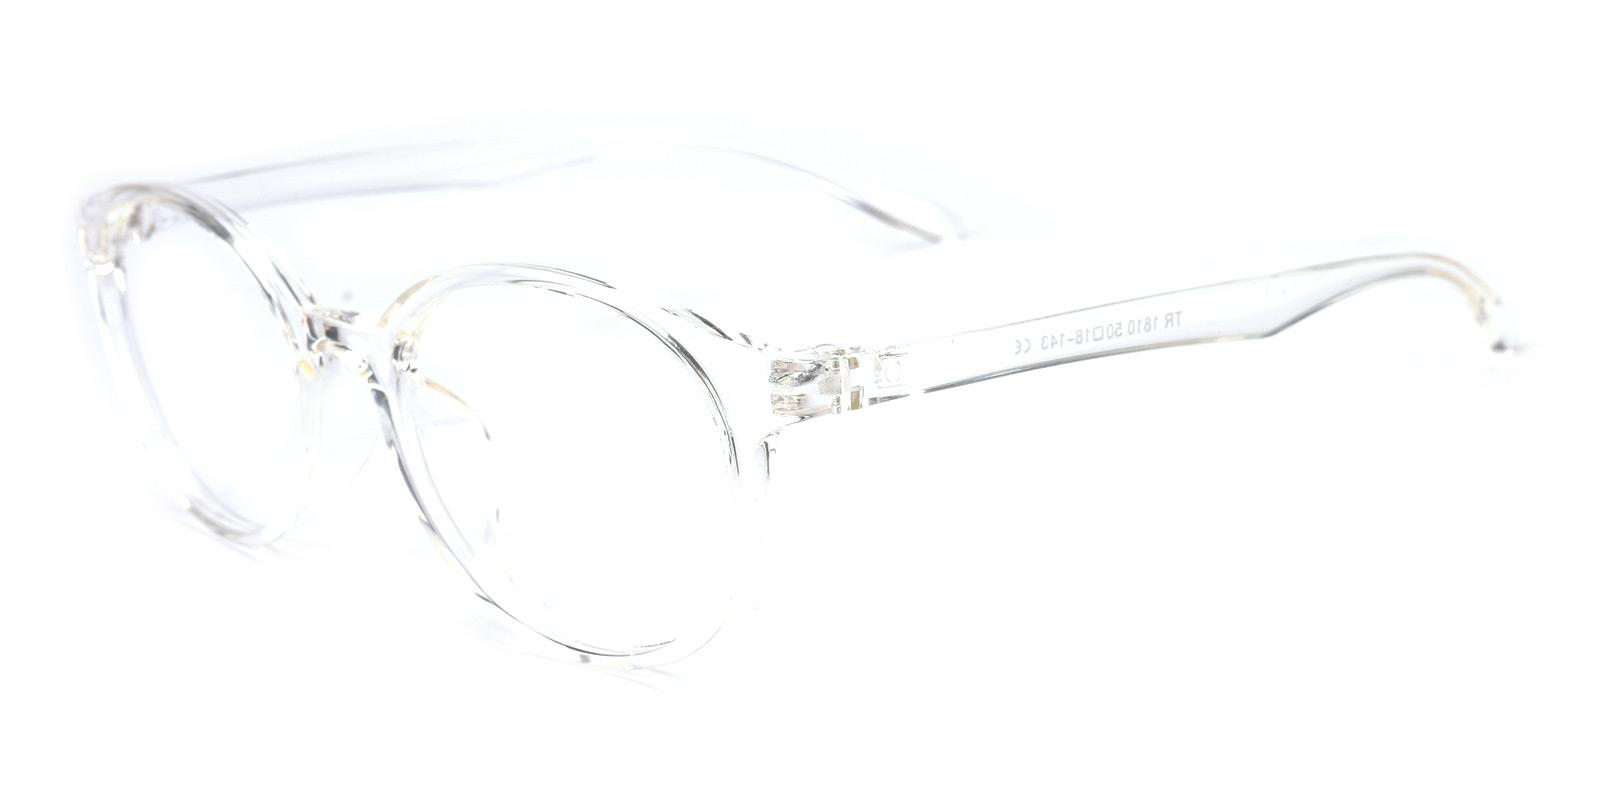 Howar-Translucent-Oval-TR-Eyeglasses-detail